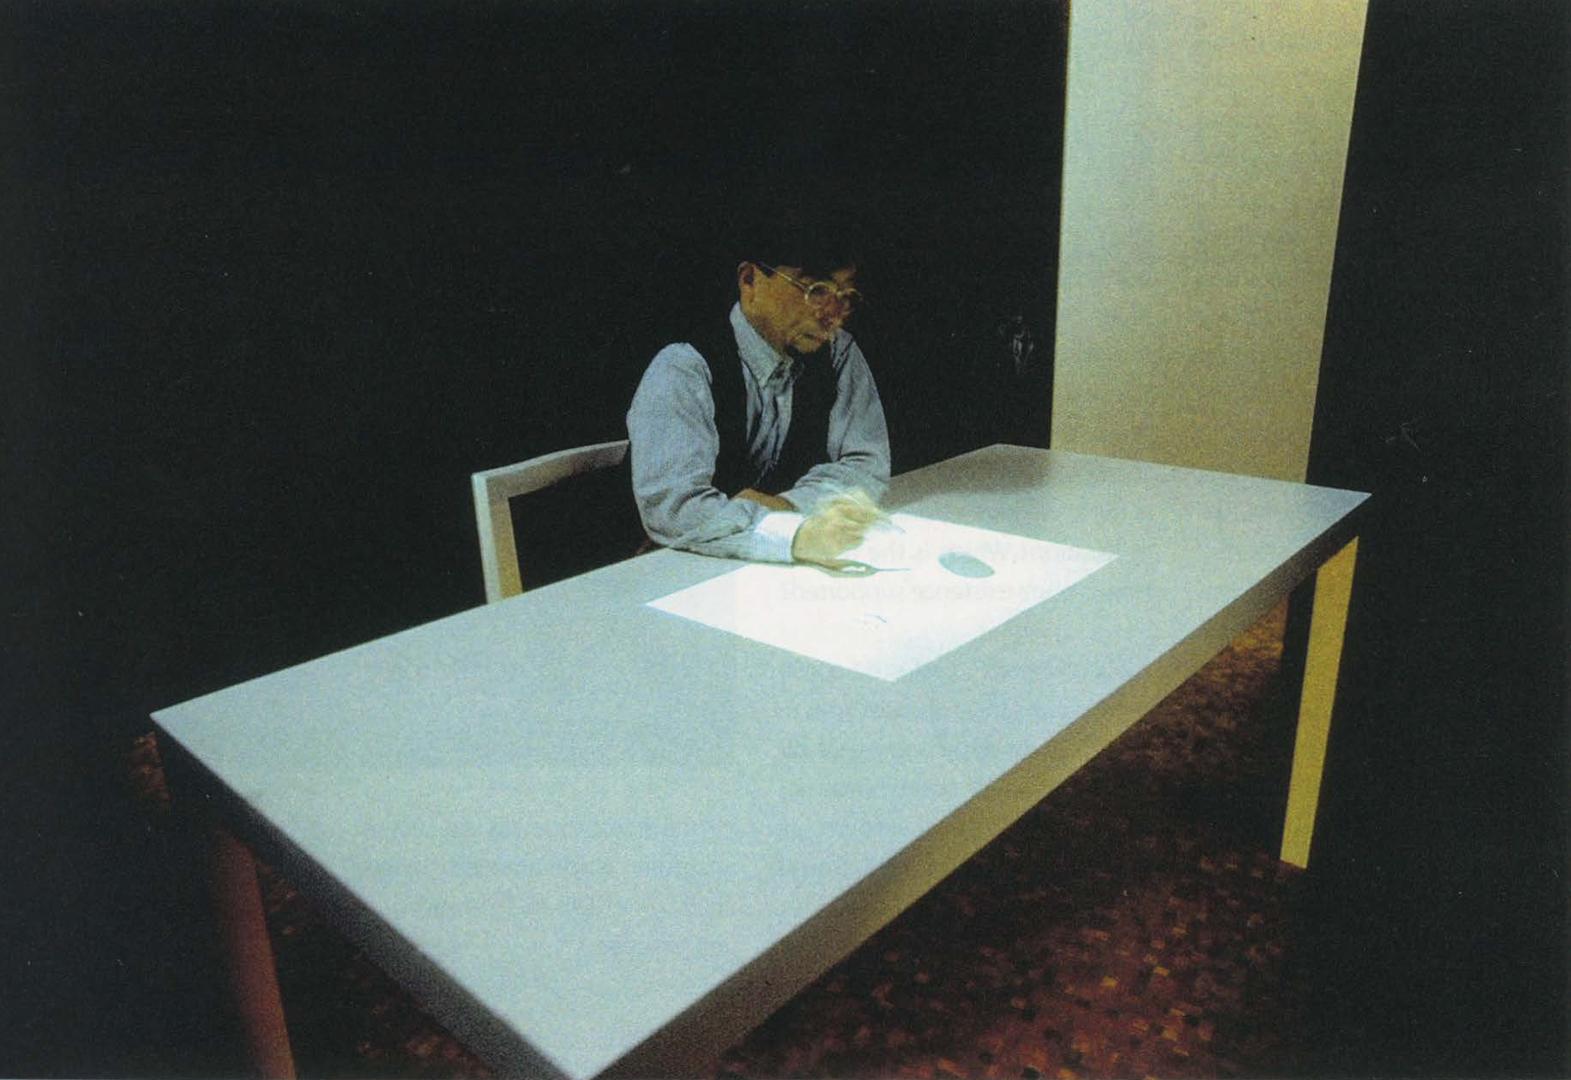 ©1996, Masaki Fujihata